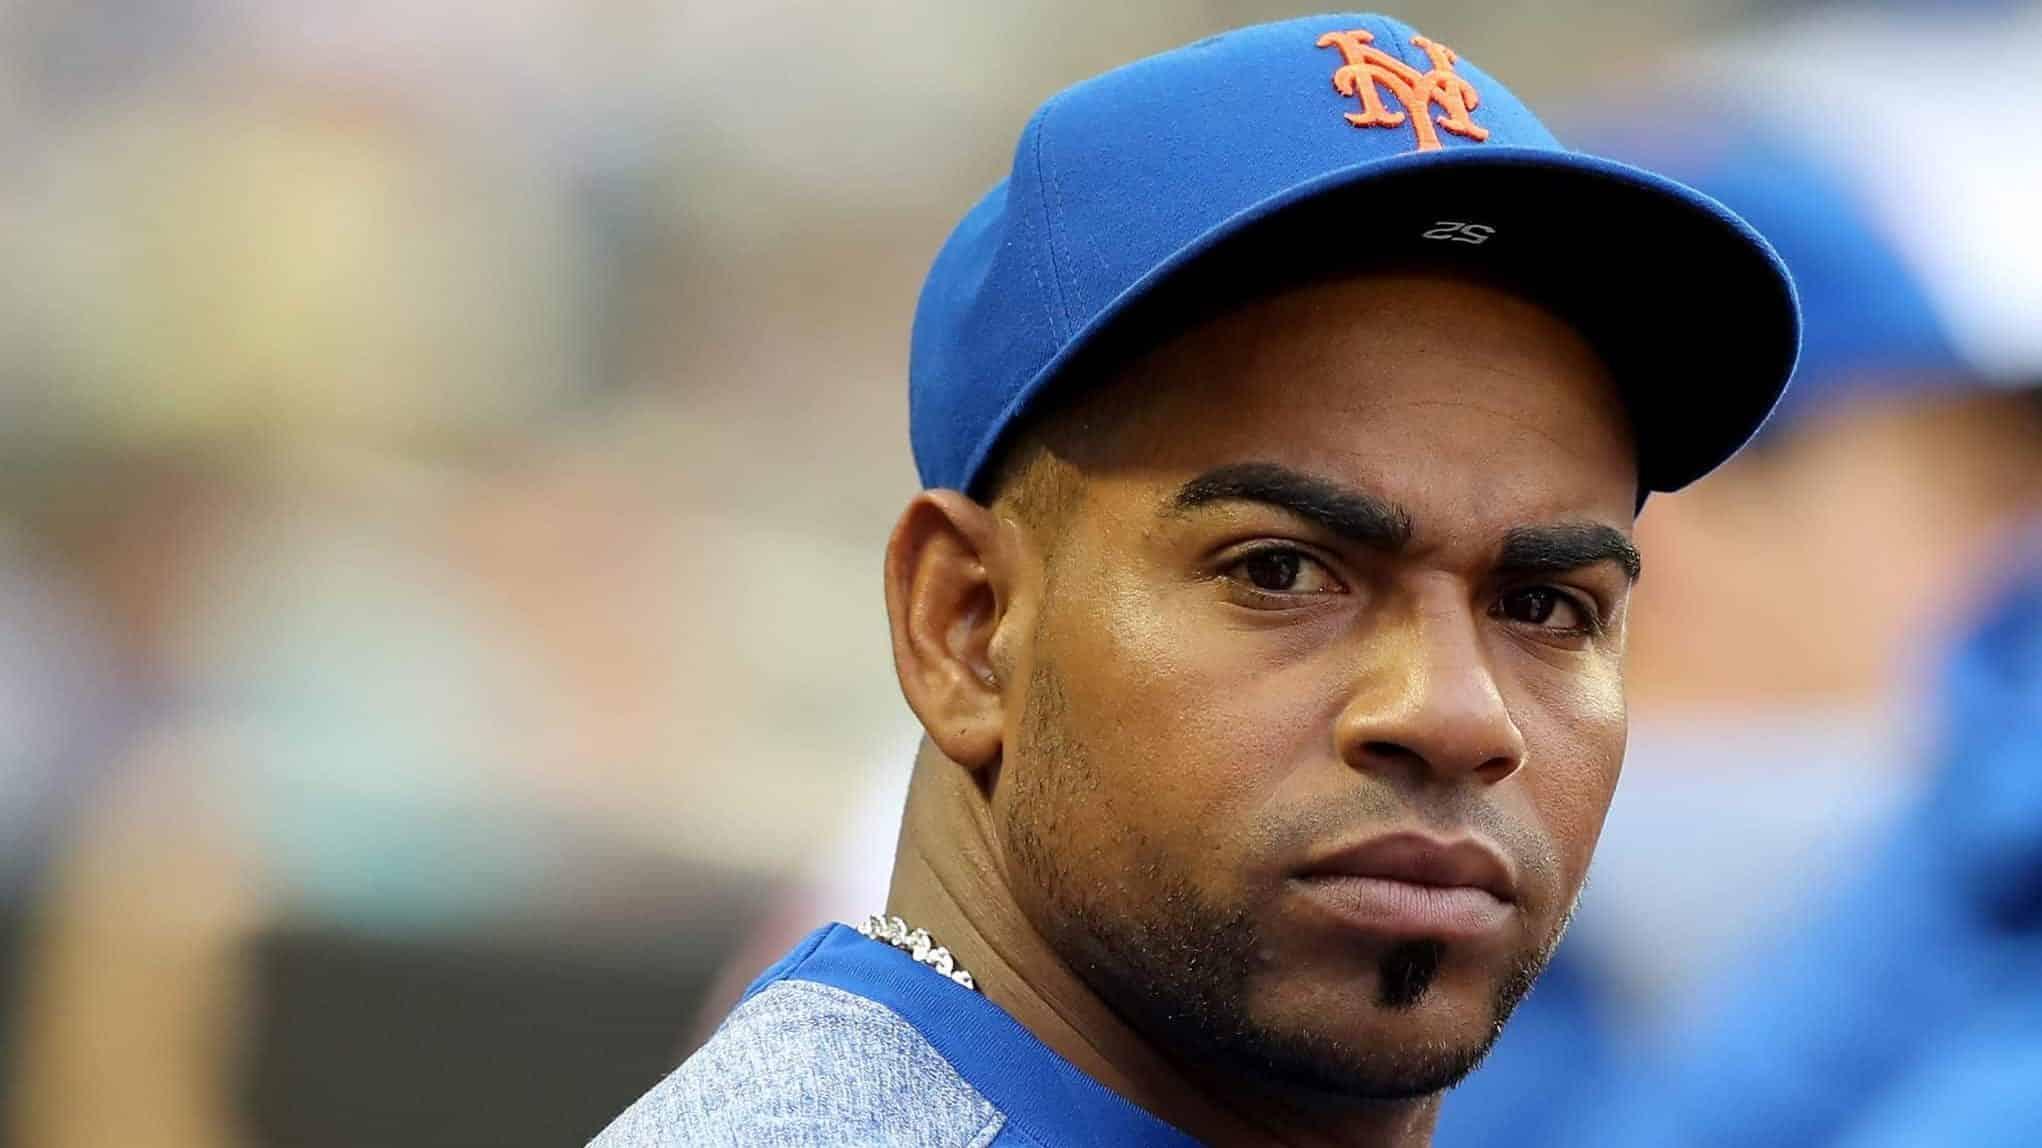 Yoenis Cespedes New York Mets